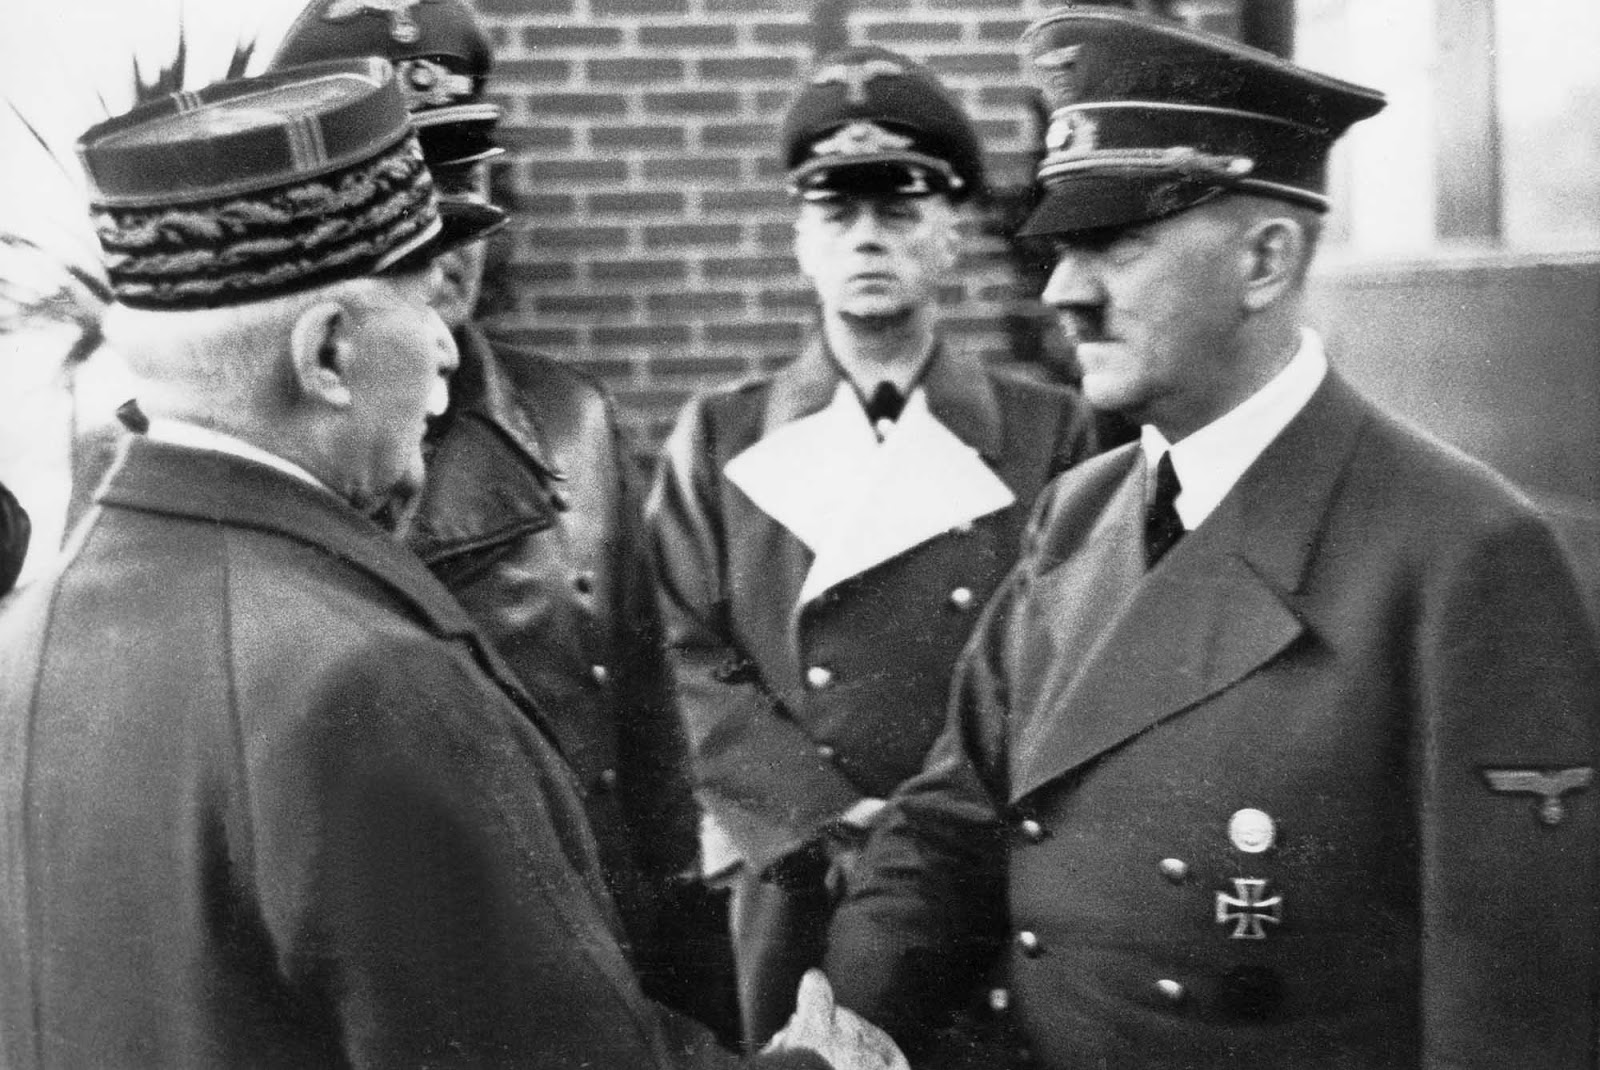 Pétain rencontre Hitler, 1940